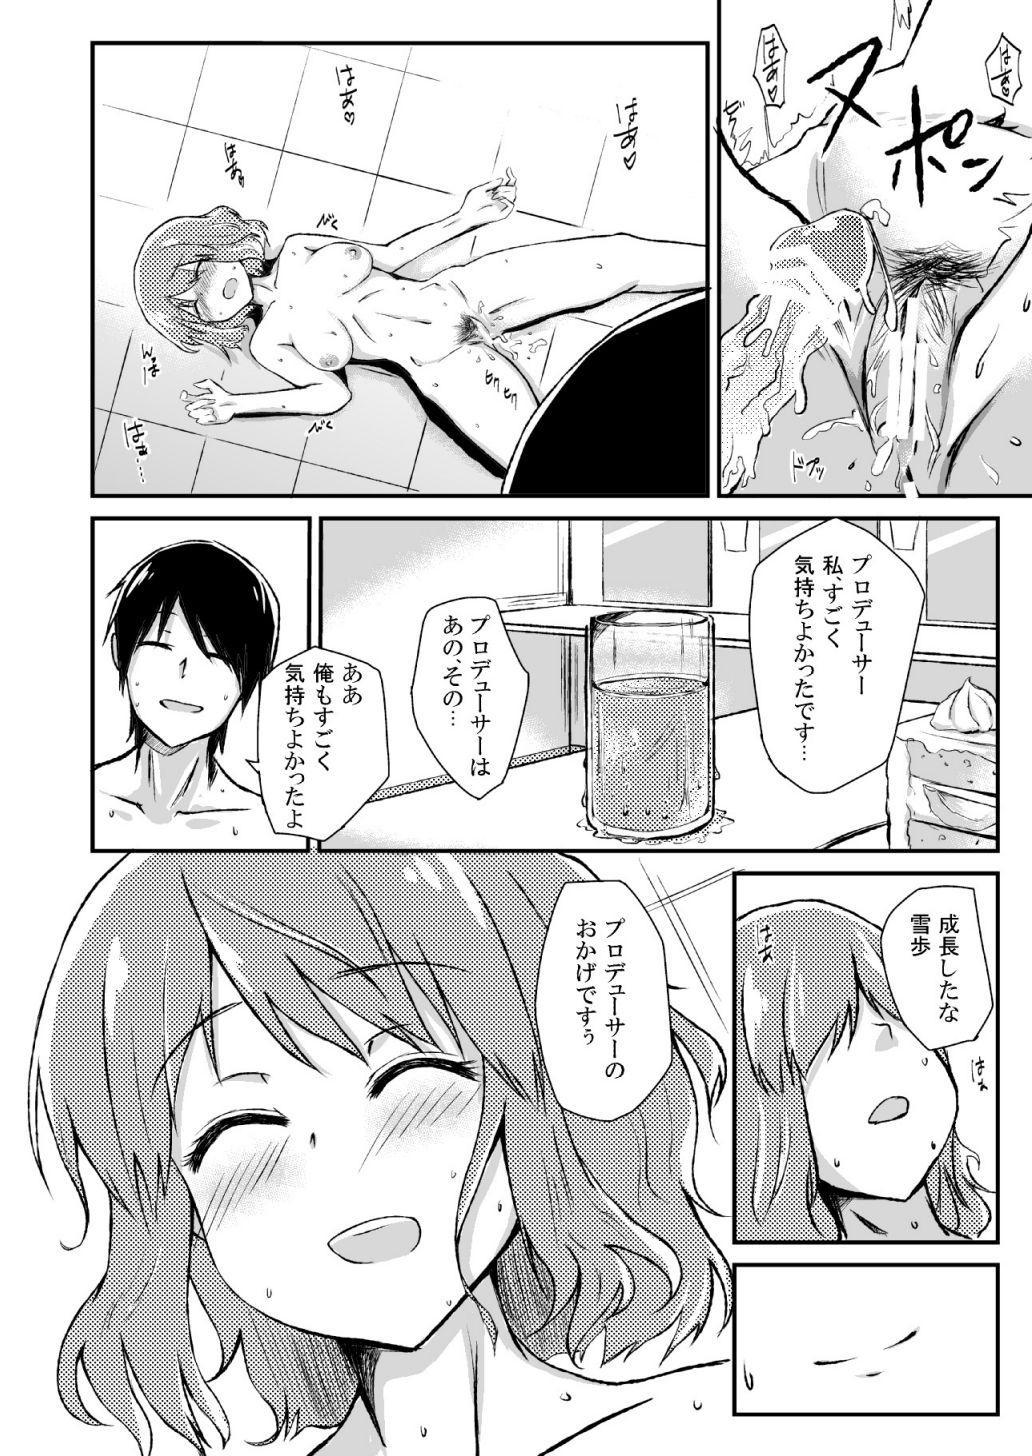 Himitsu Tokkun Advance!! 22